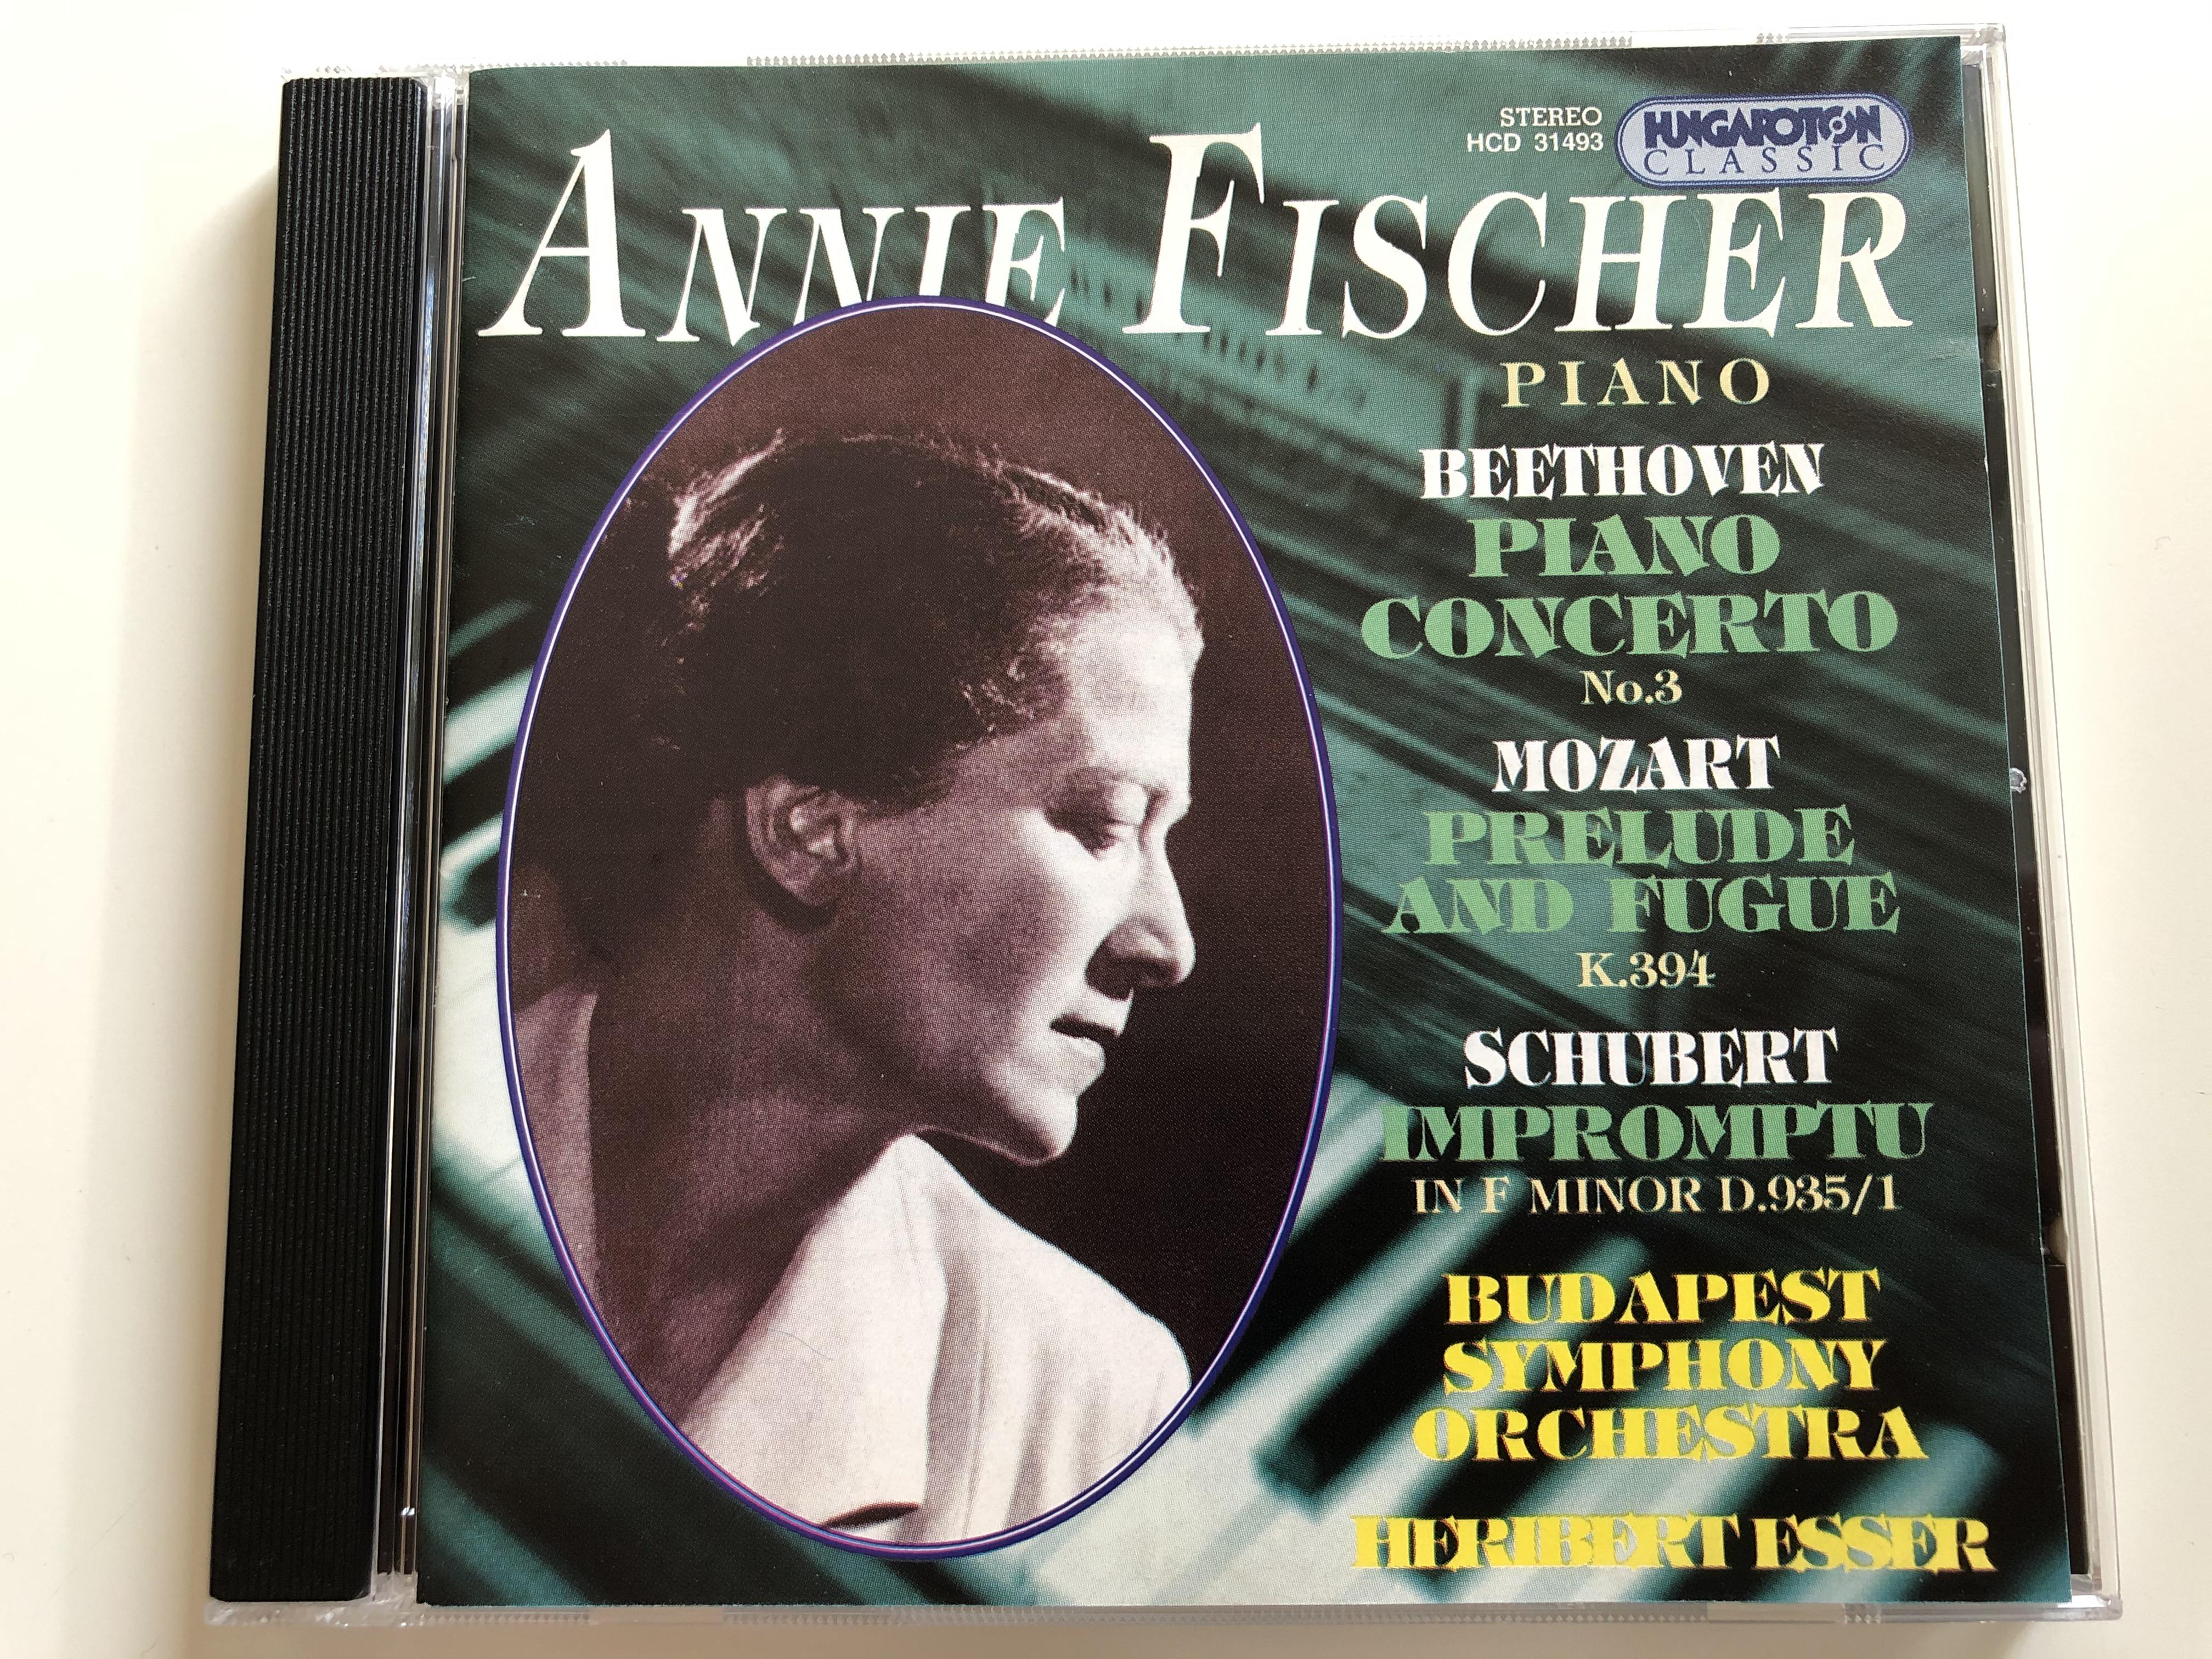 annie-fischer-piano-beethoven-piano-concerto-no.3-mozart-prelude-and-fugue-k.394-schubert-impromptu-in-f-minor-d.9351-budapest-symphony-orchestra-heribert-esser-hungaroton-classic-au-1-.jpg